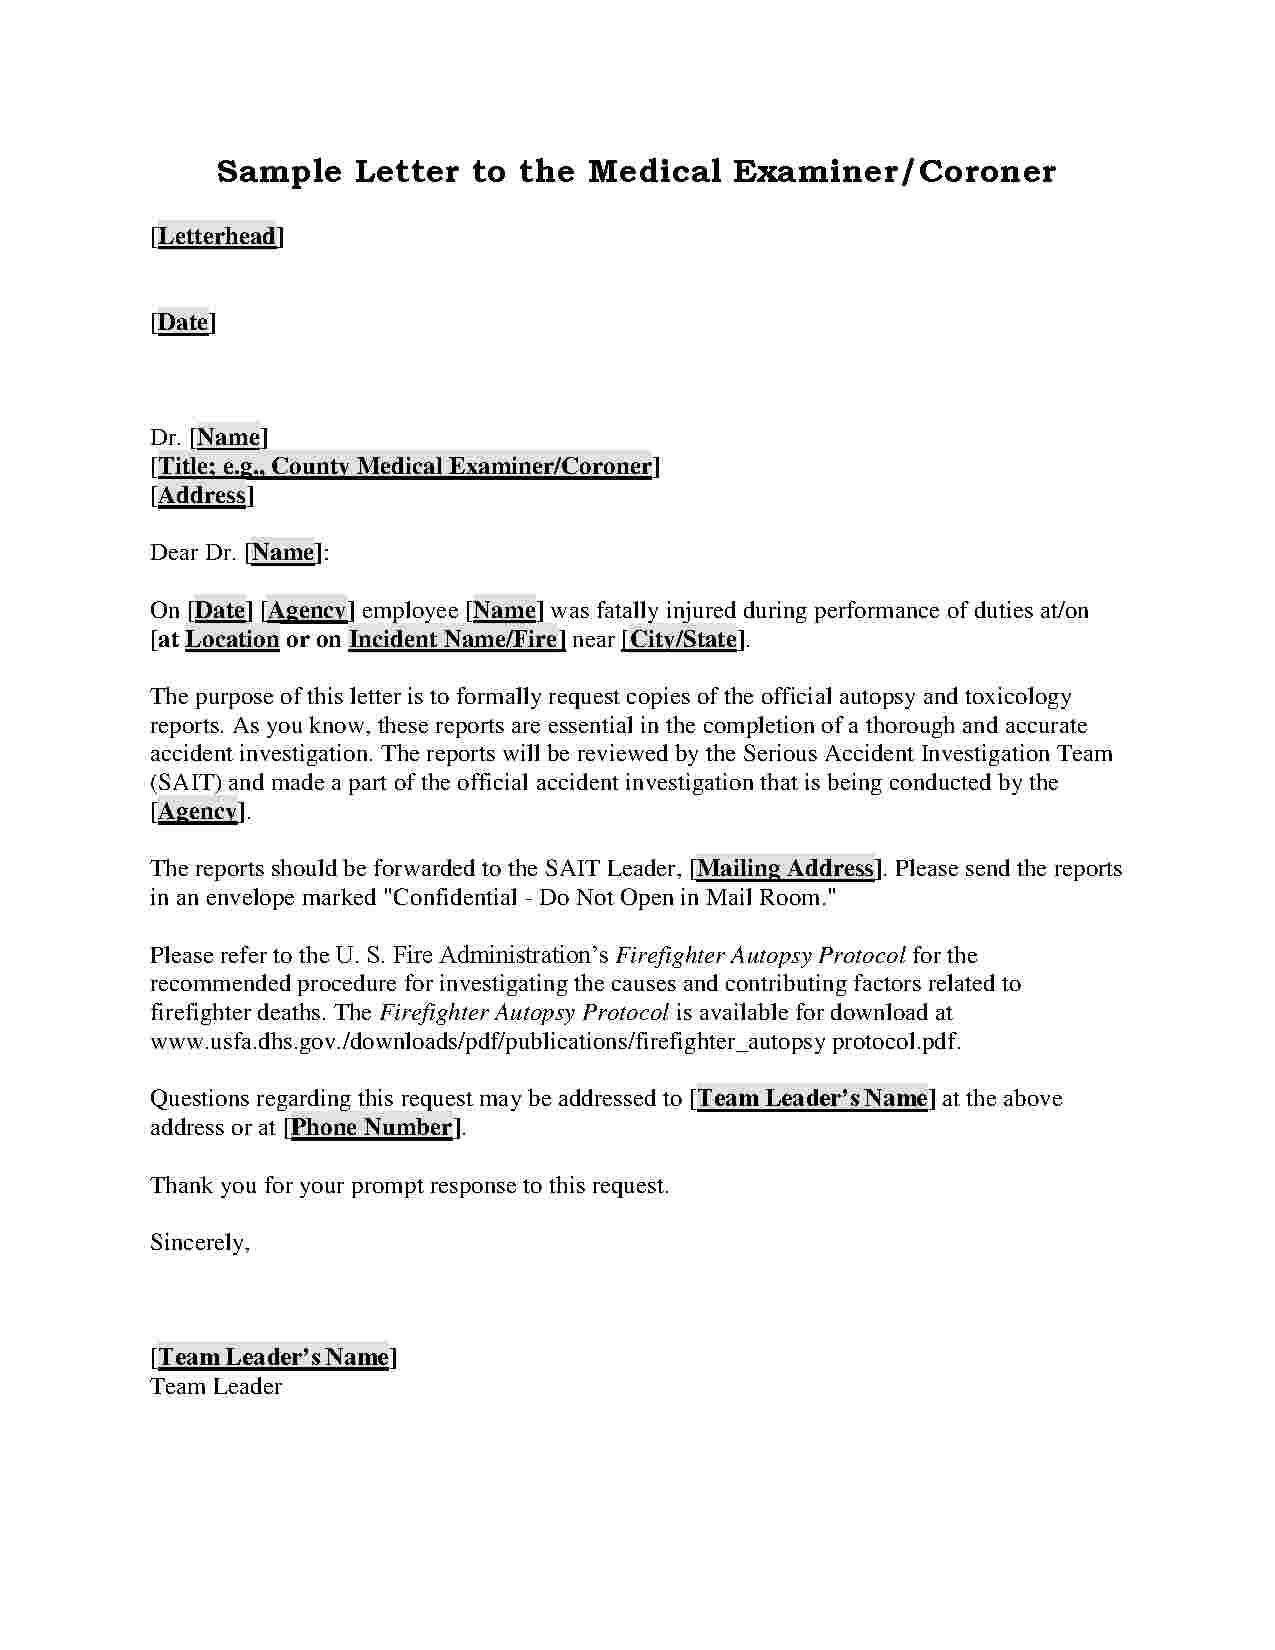 Sample Cease And Desist Letter To Former Employee In 2021 Letter Template Word Lettering Letter Templates